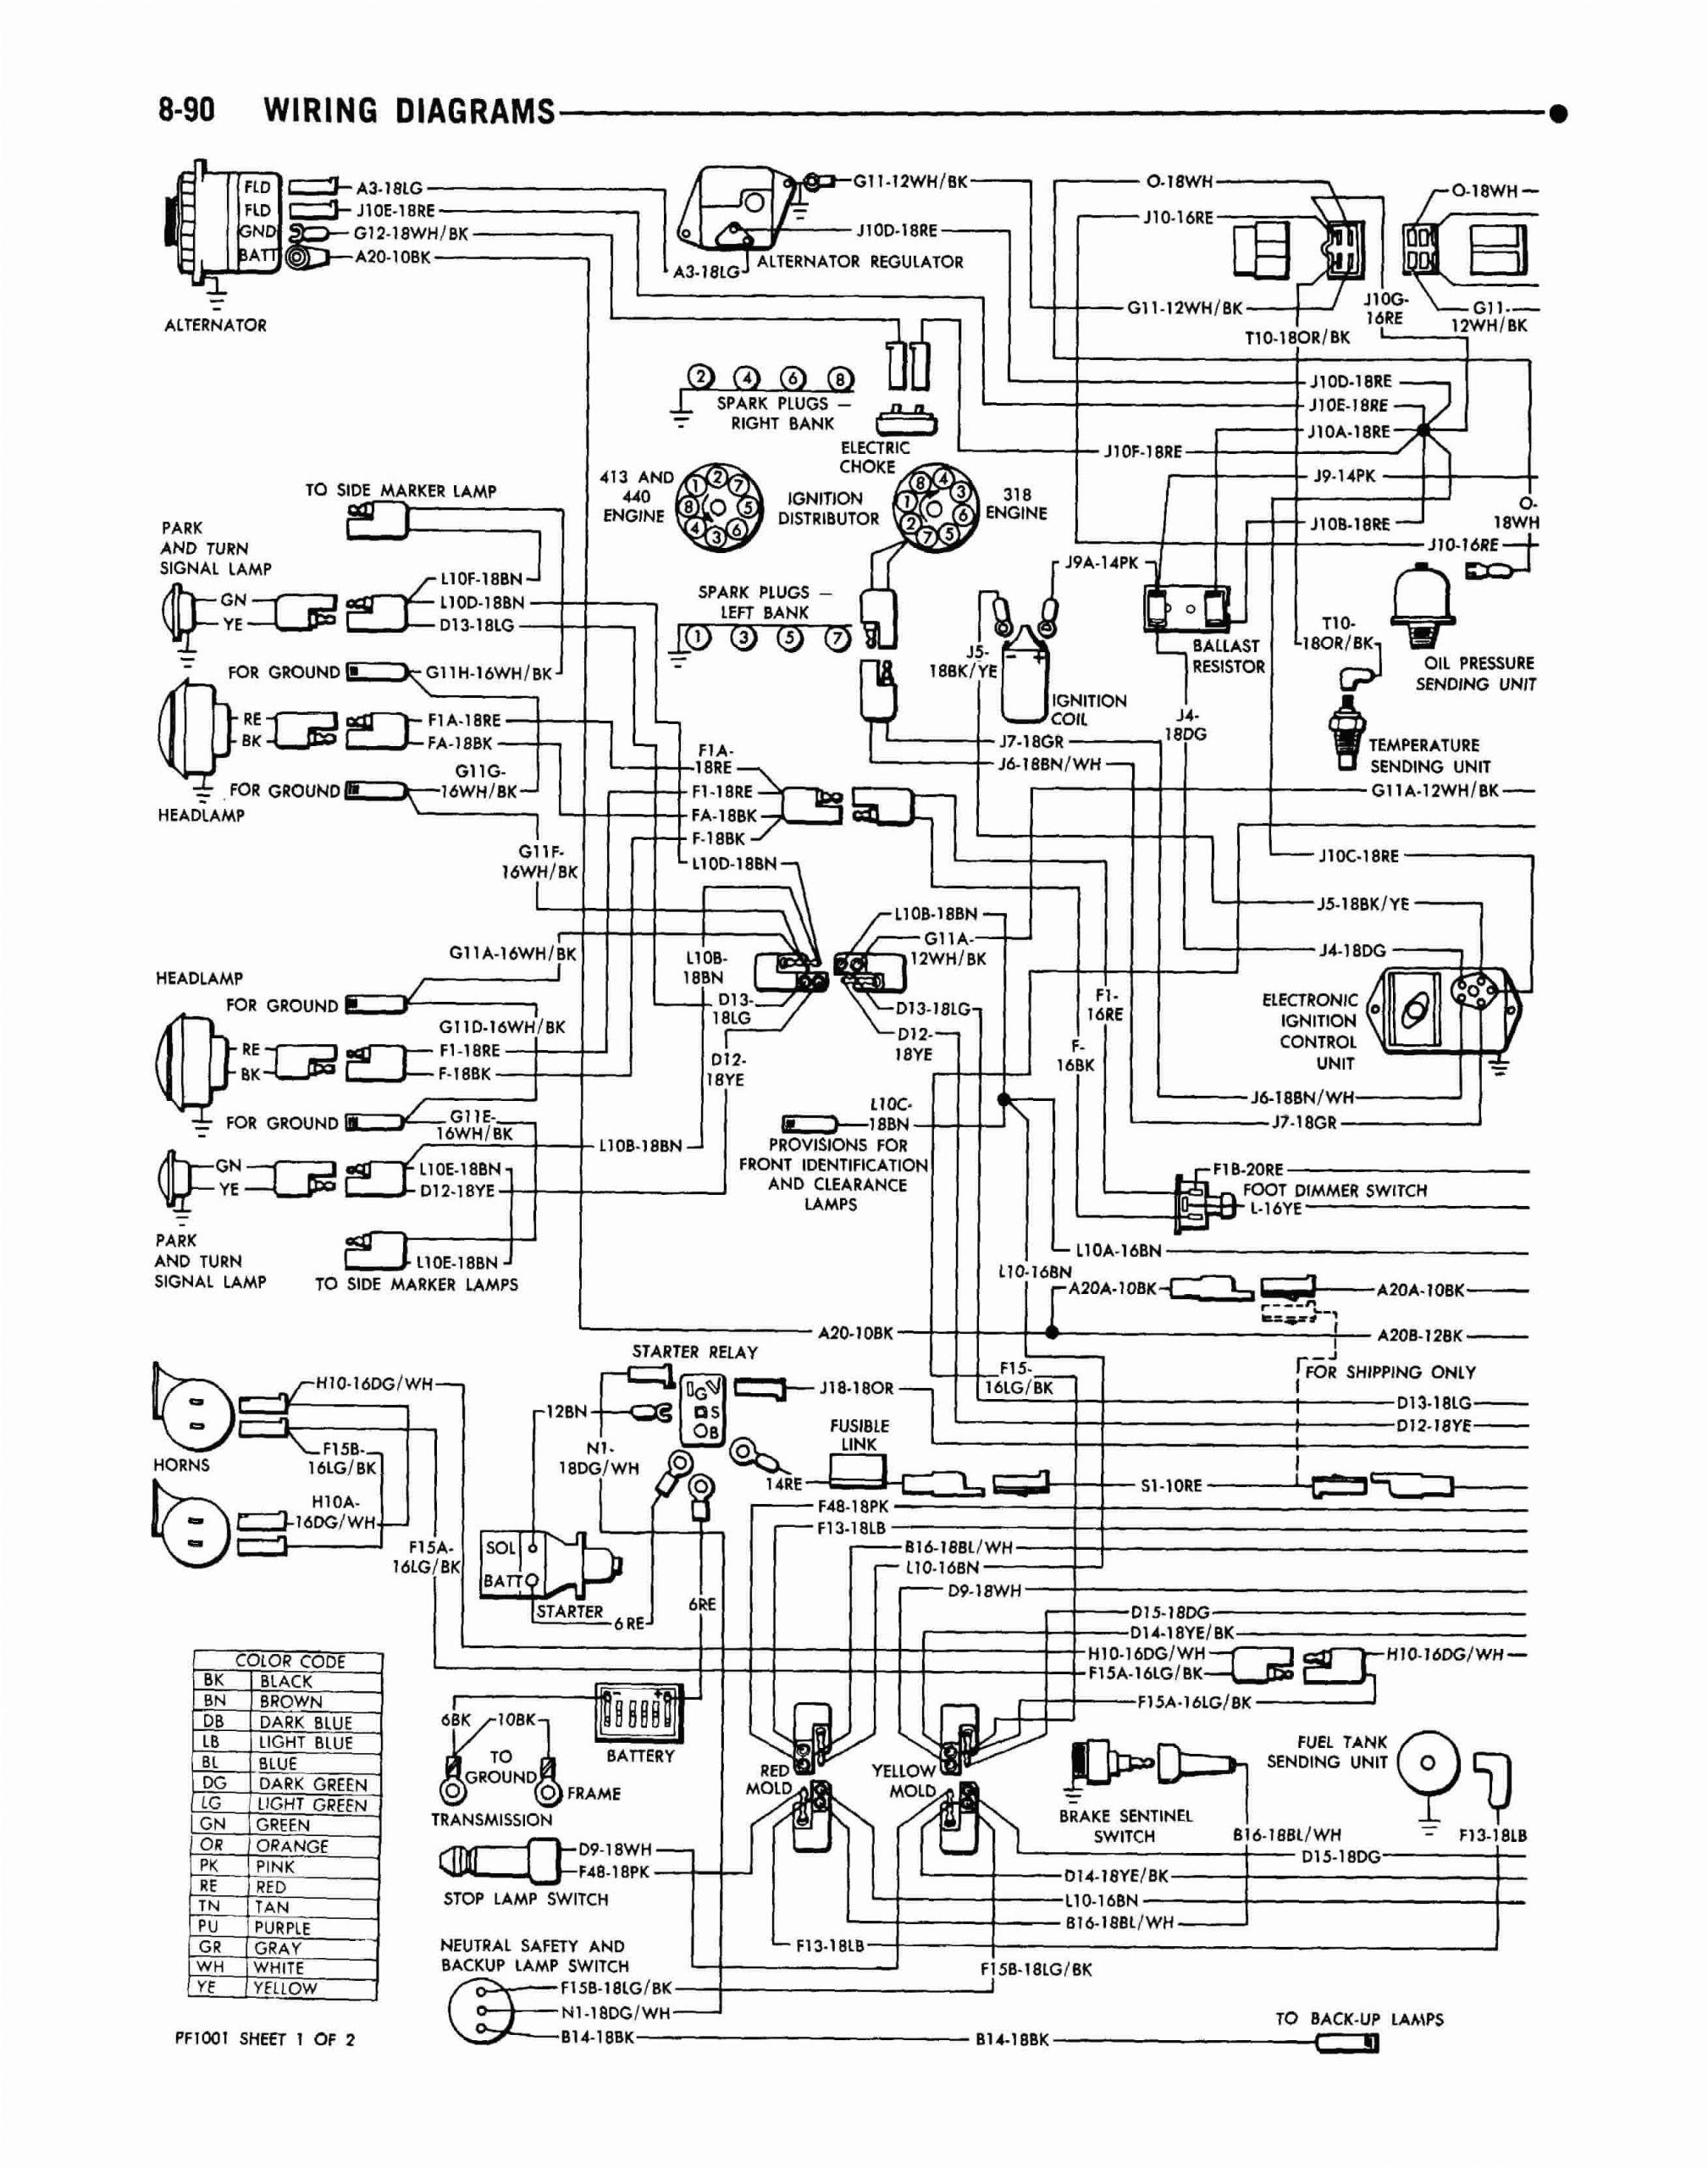 1978 dodge truck wiring diagram new wiring diagrams winnebago pressauto net download size handphone cool of 1978 dodge truck wiring diagram gif